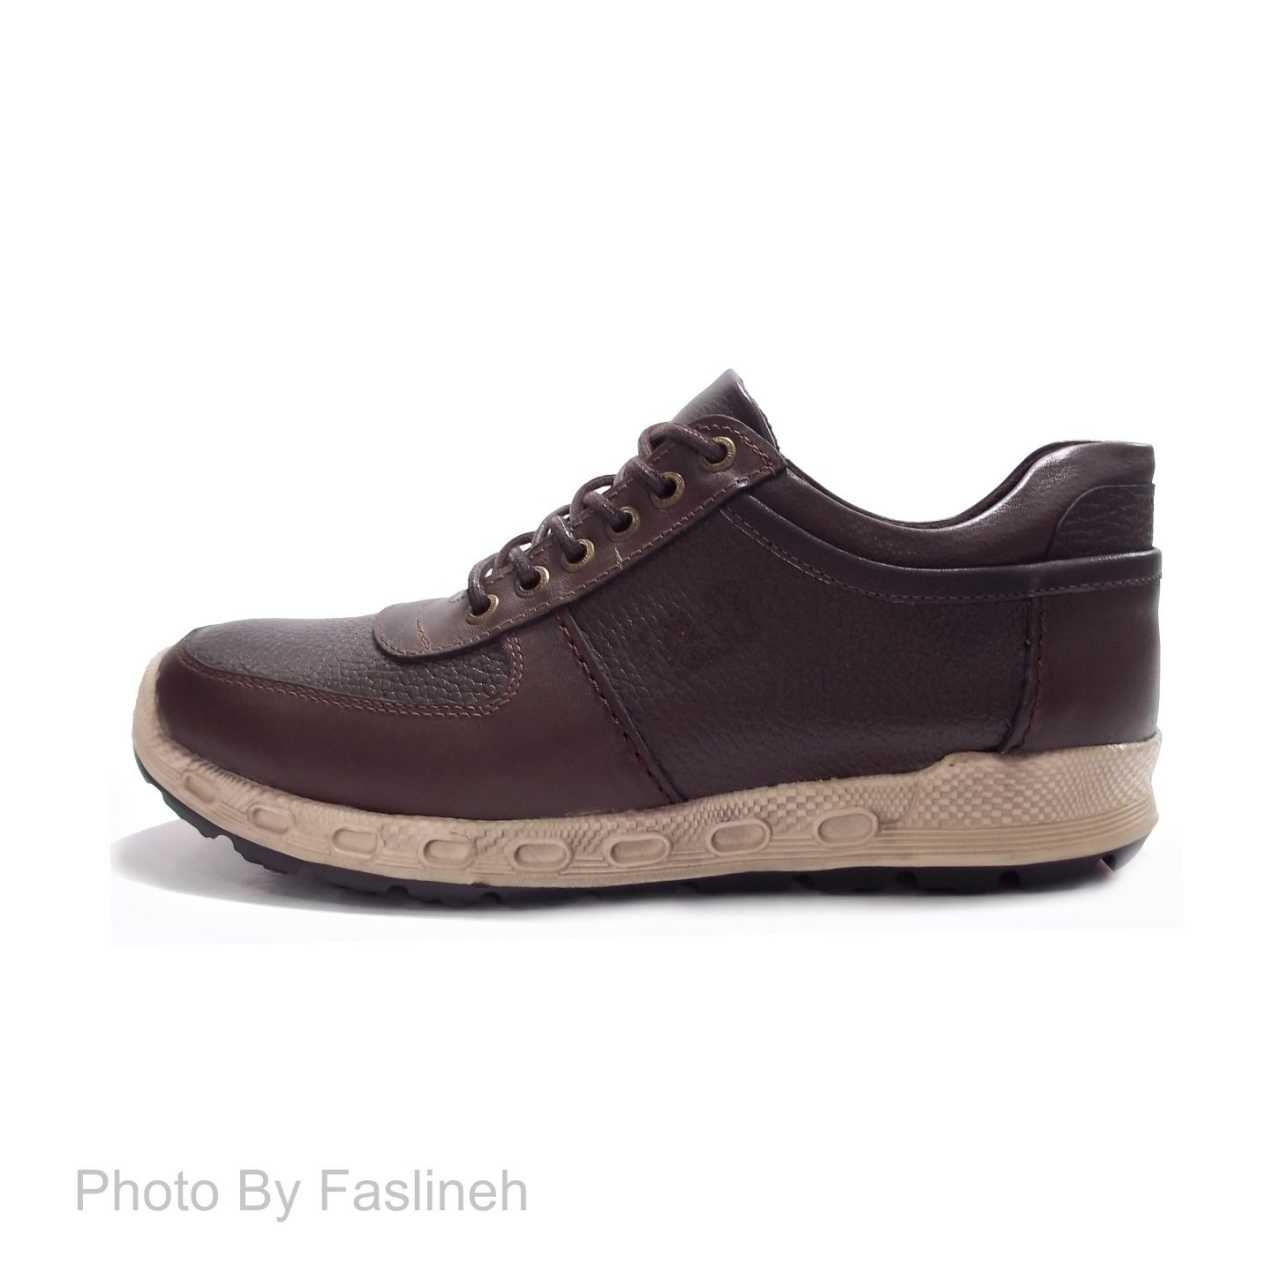 کفش اسپرت کت قهوه ای مدل CLS5